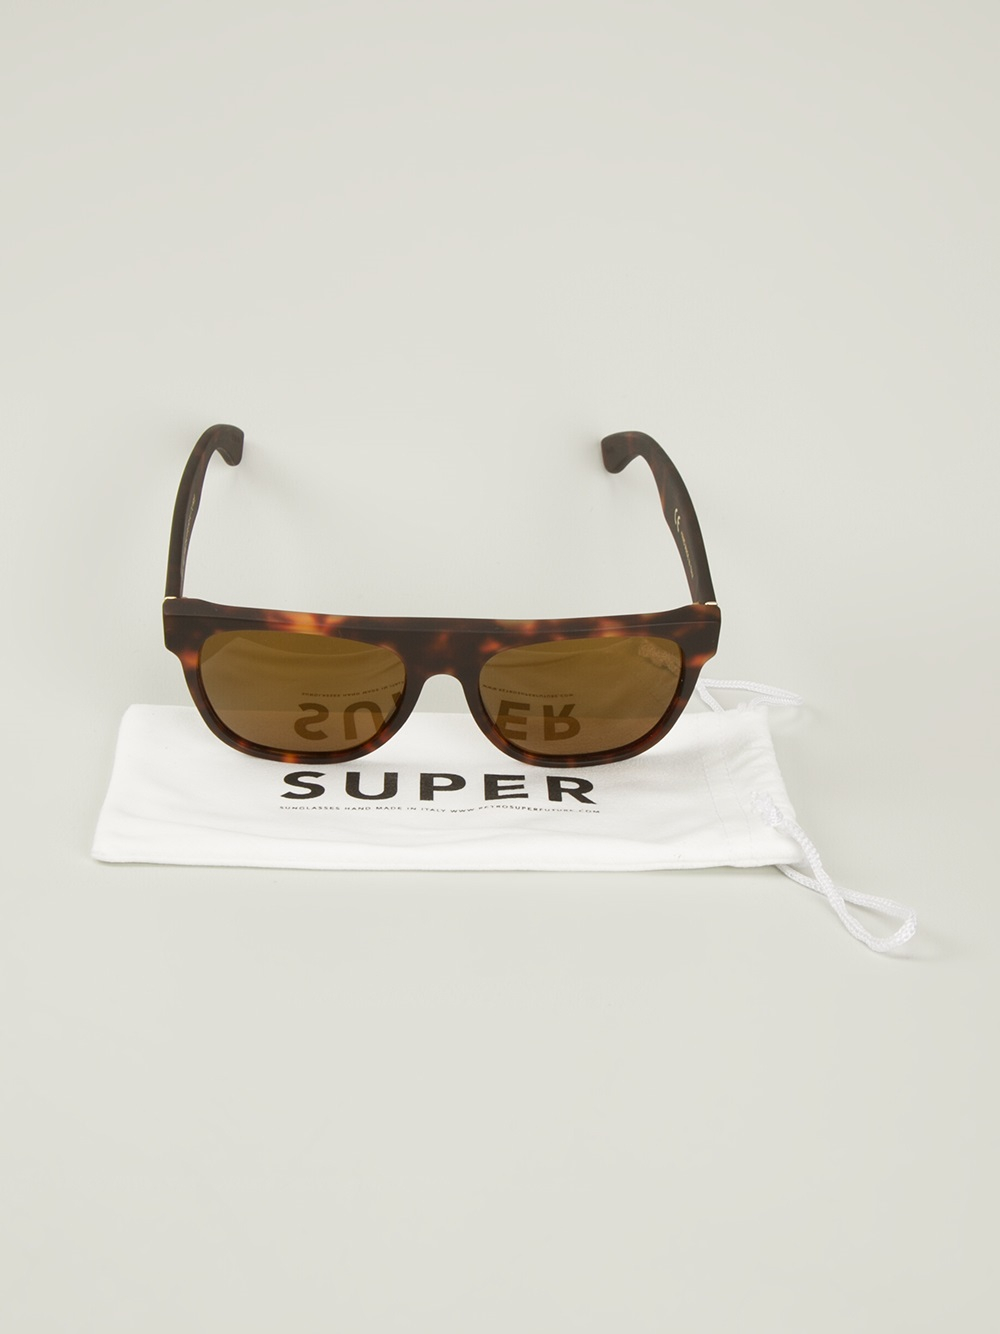 fcdbb4608888 Lyst - Retrosuperfuture Flat Top Tortoise Shell Tone Sunglasses in ...